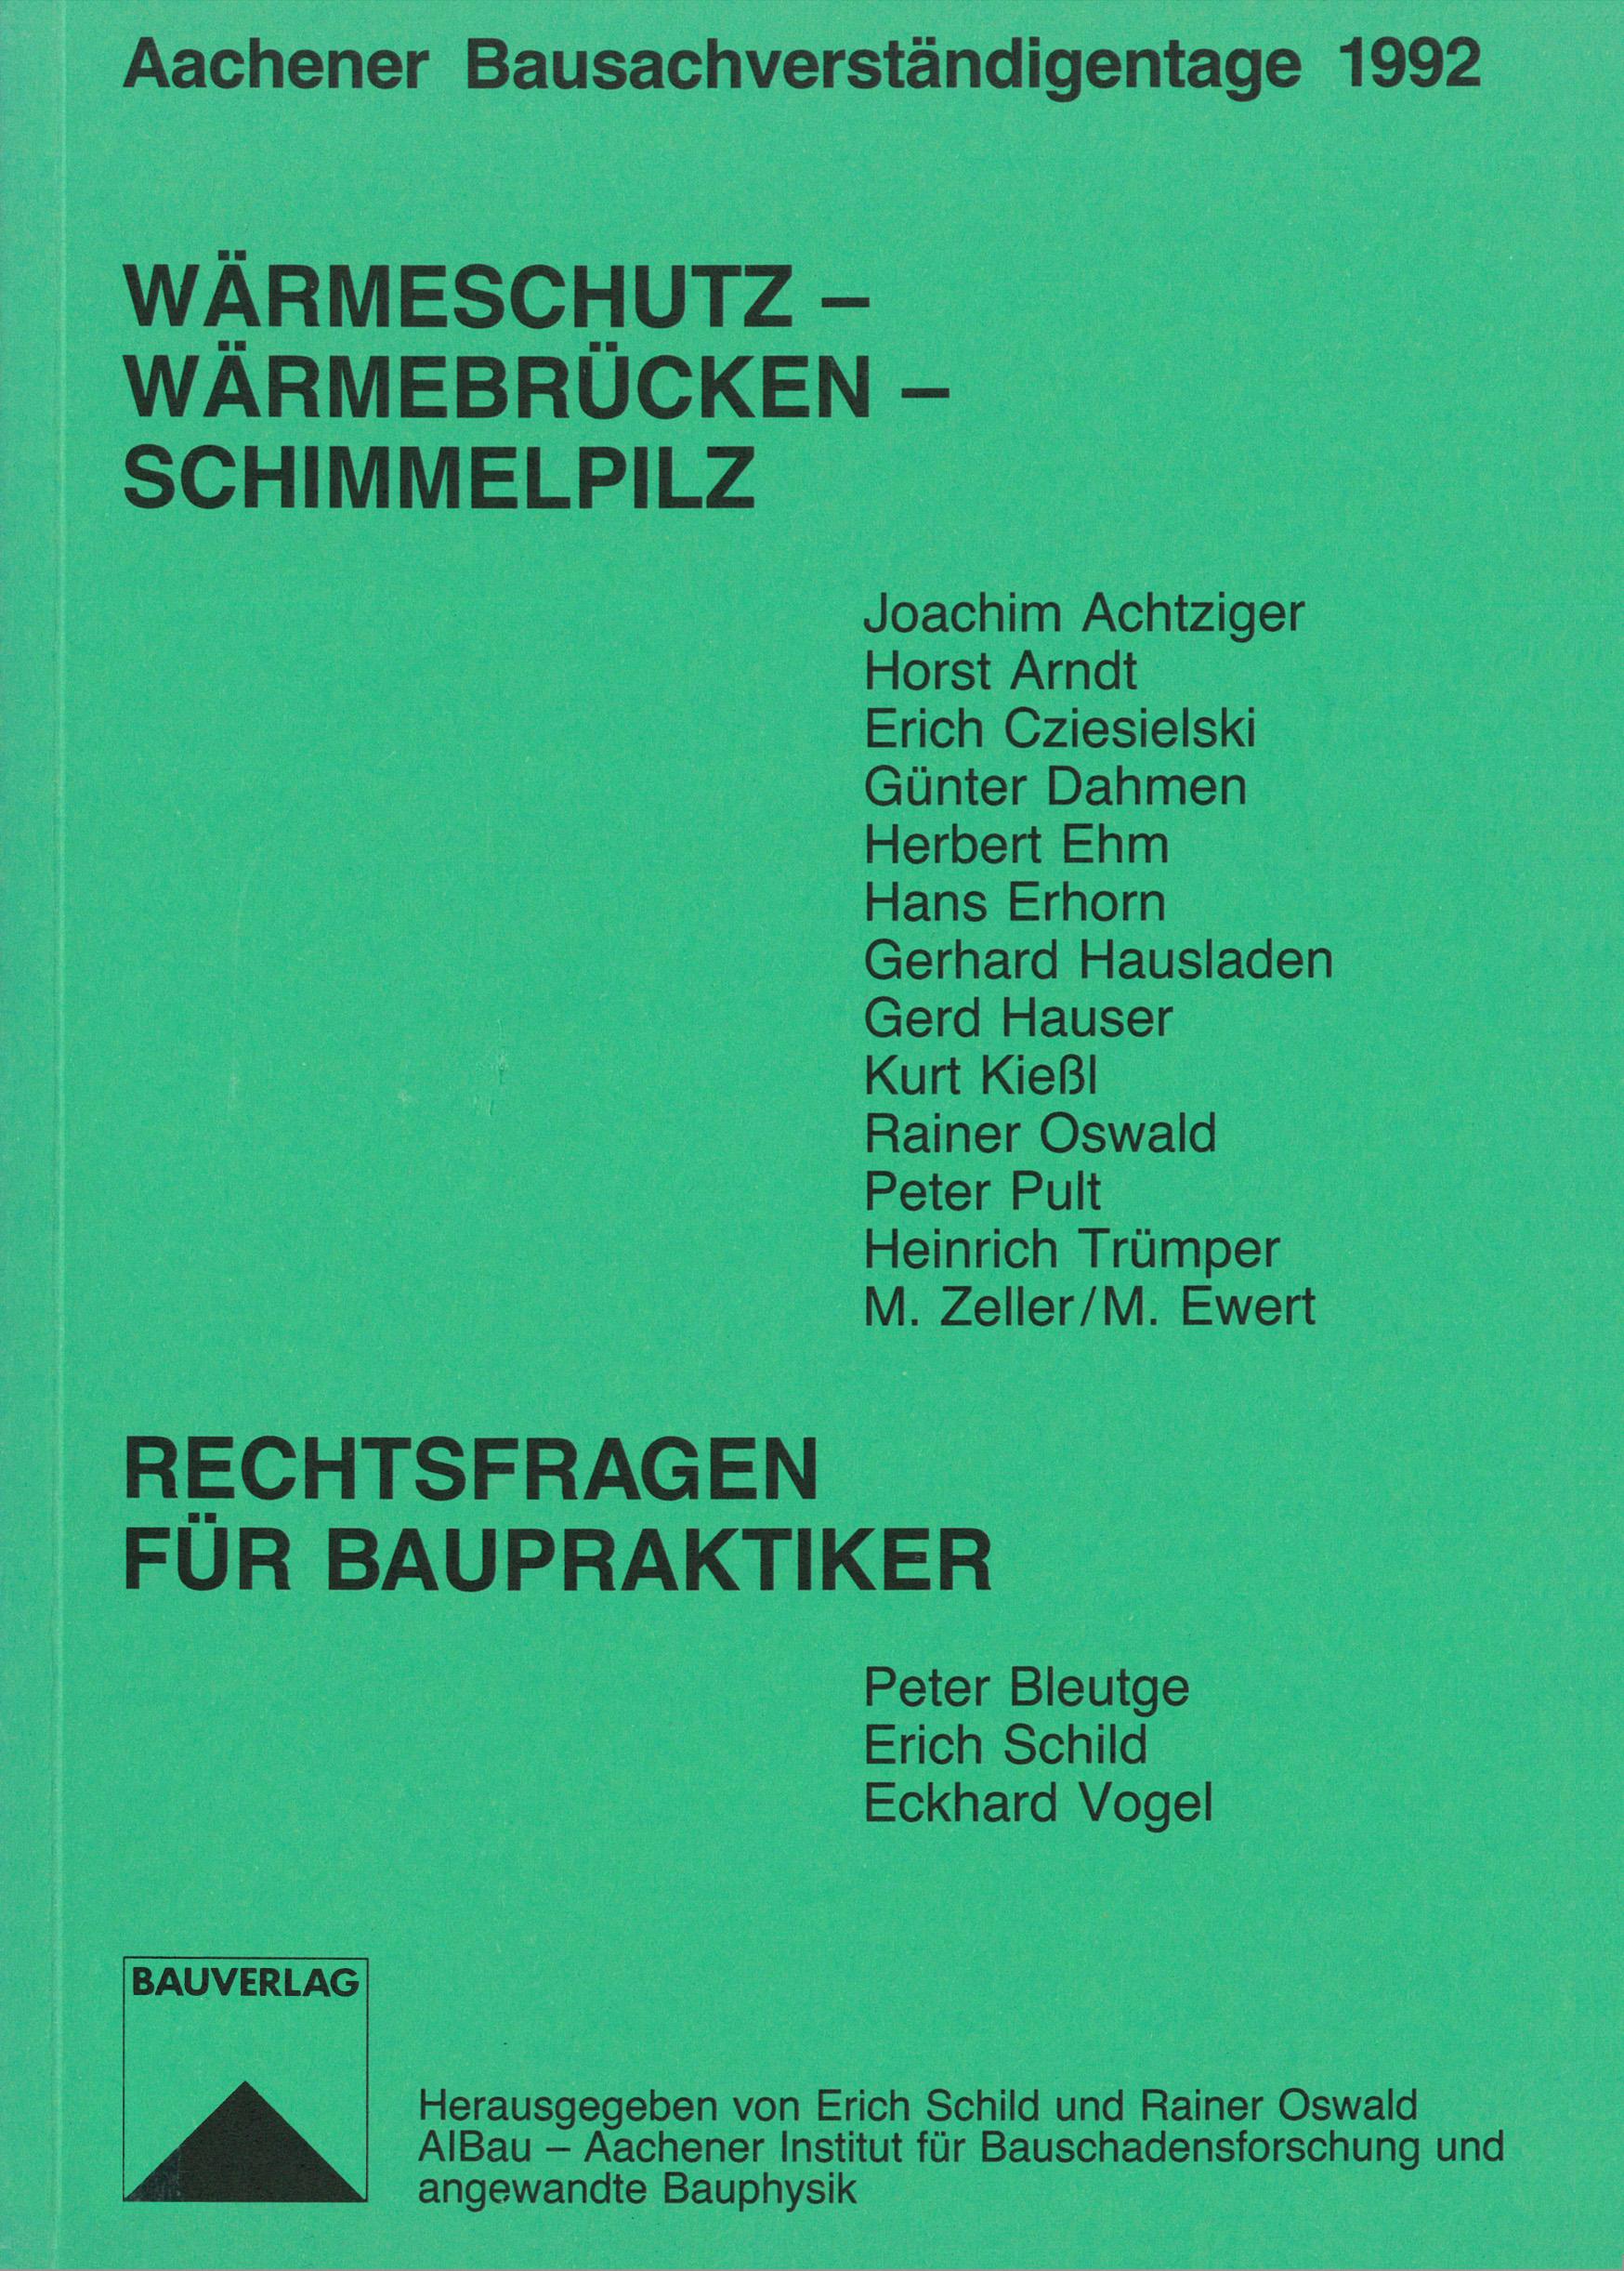 Tagungsband: Wärmeschutz - Wärmebrücken - Schimmelpilz - Coverbild